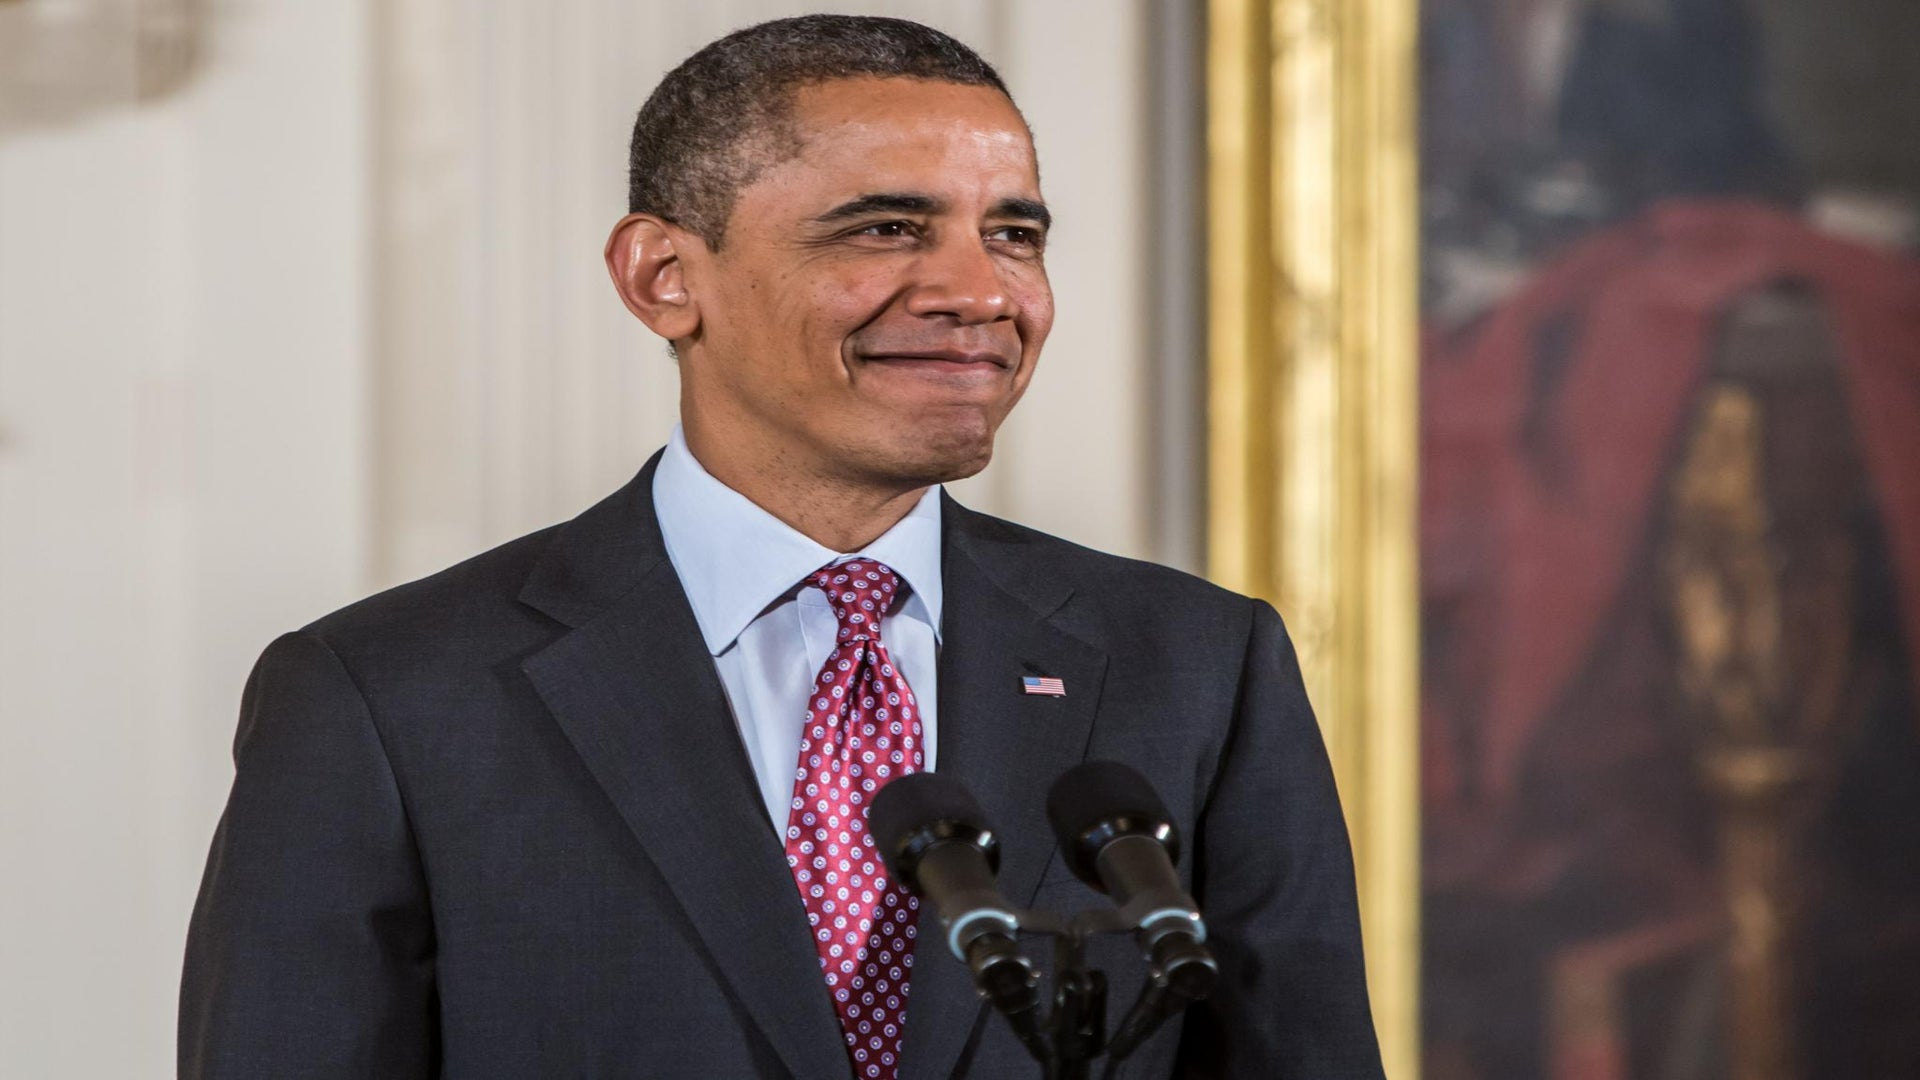 President Obama Shows Off Beatboxing Skills In Vietnam